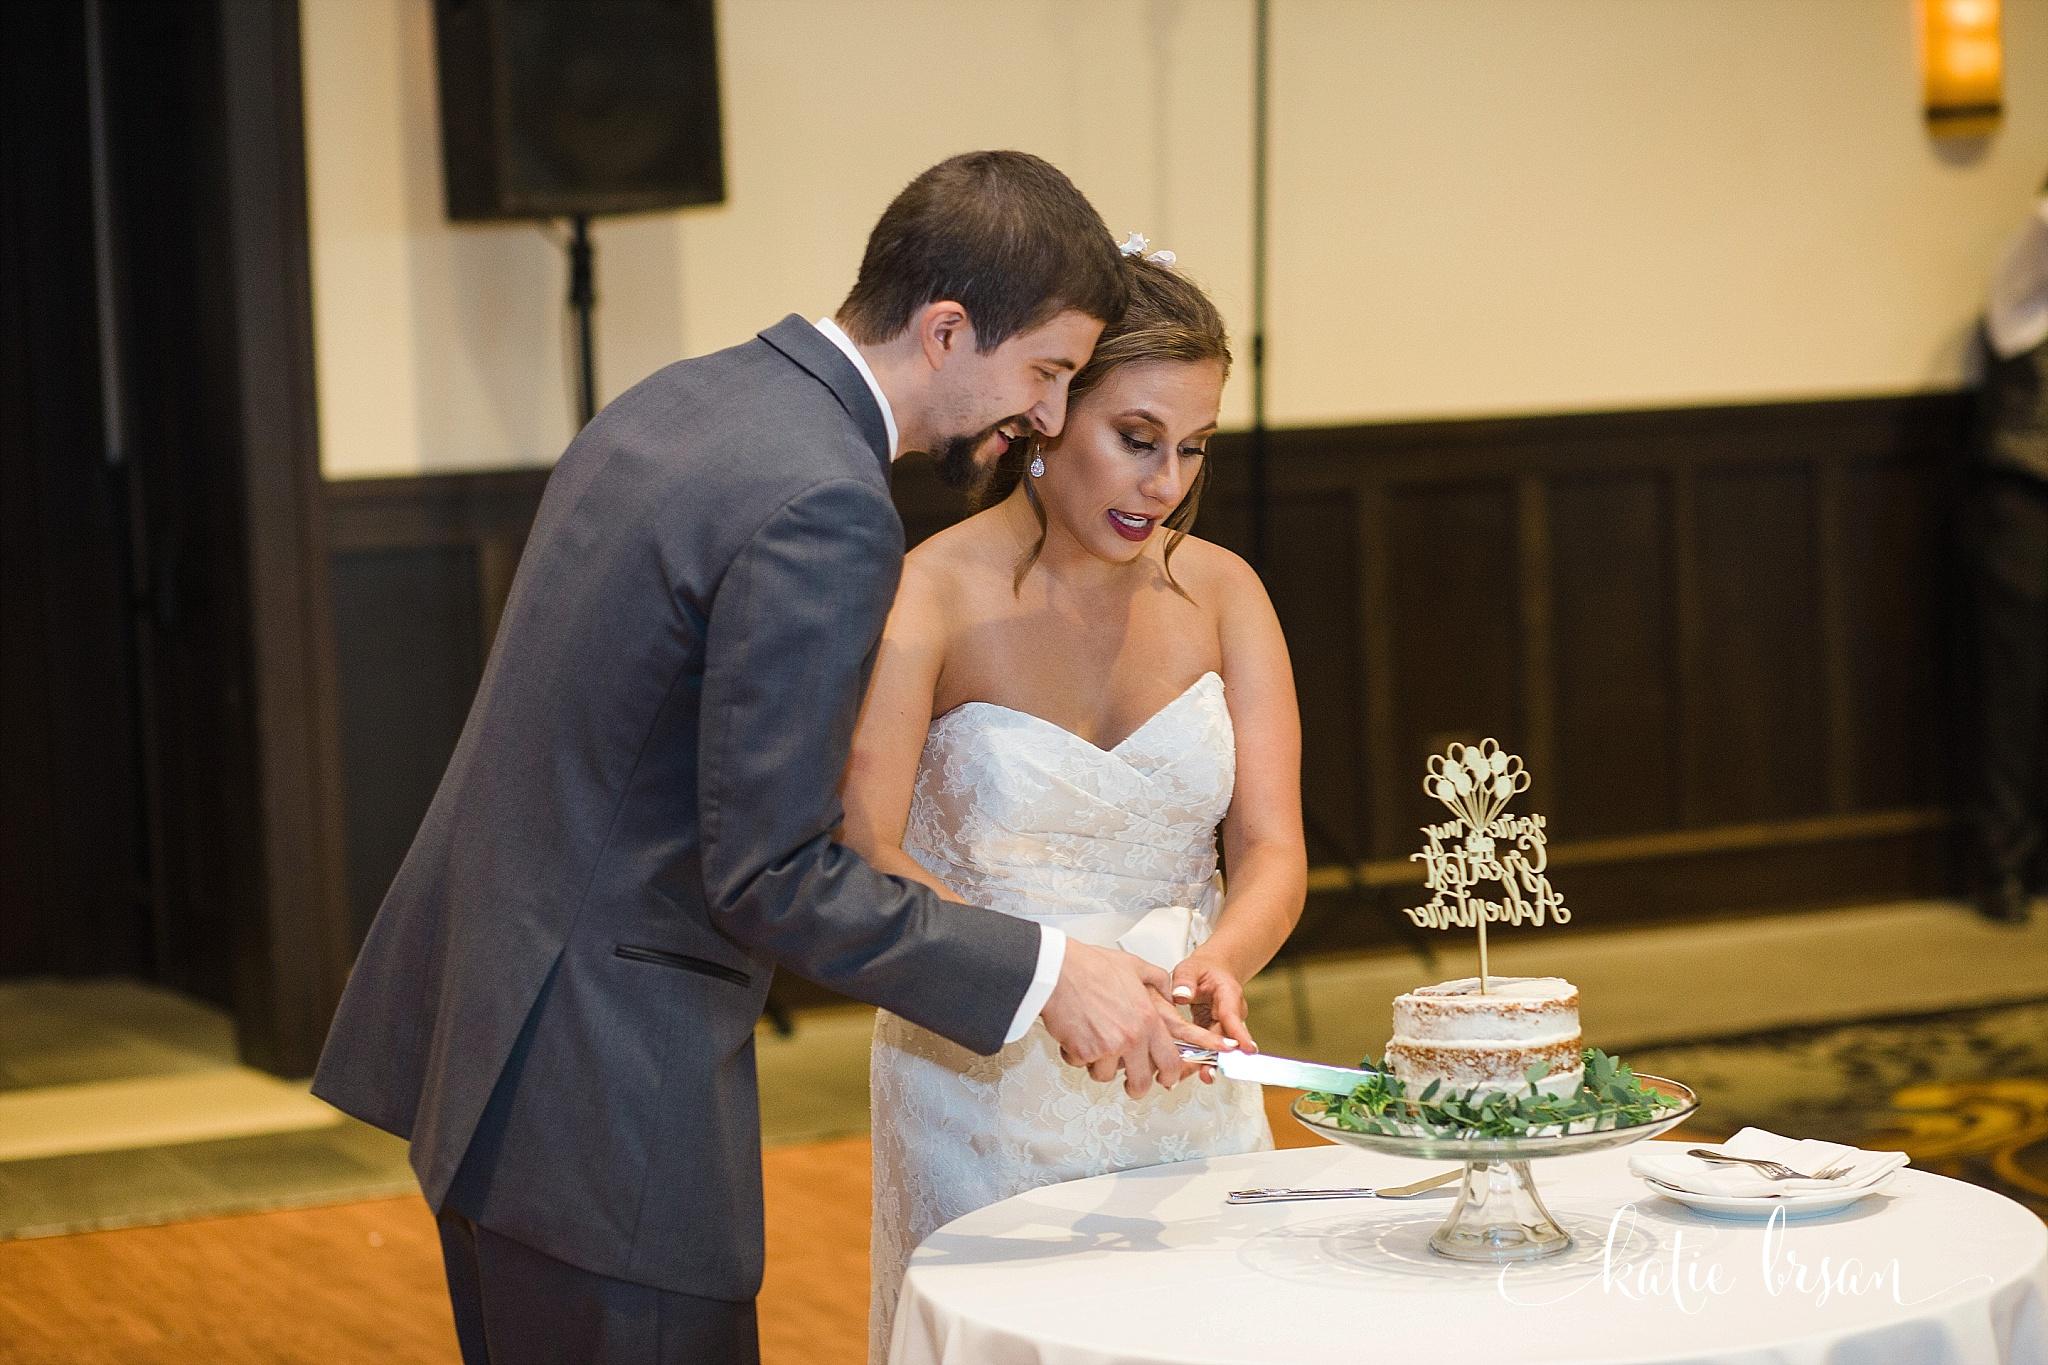 MistWoodGolfClub_Wedding_Romeoville_0795.jpg